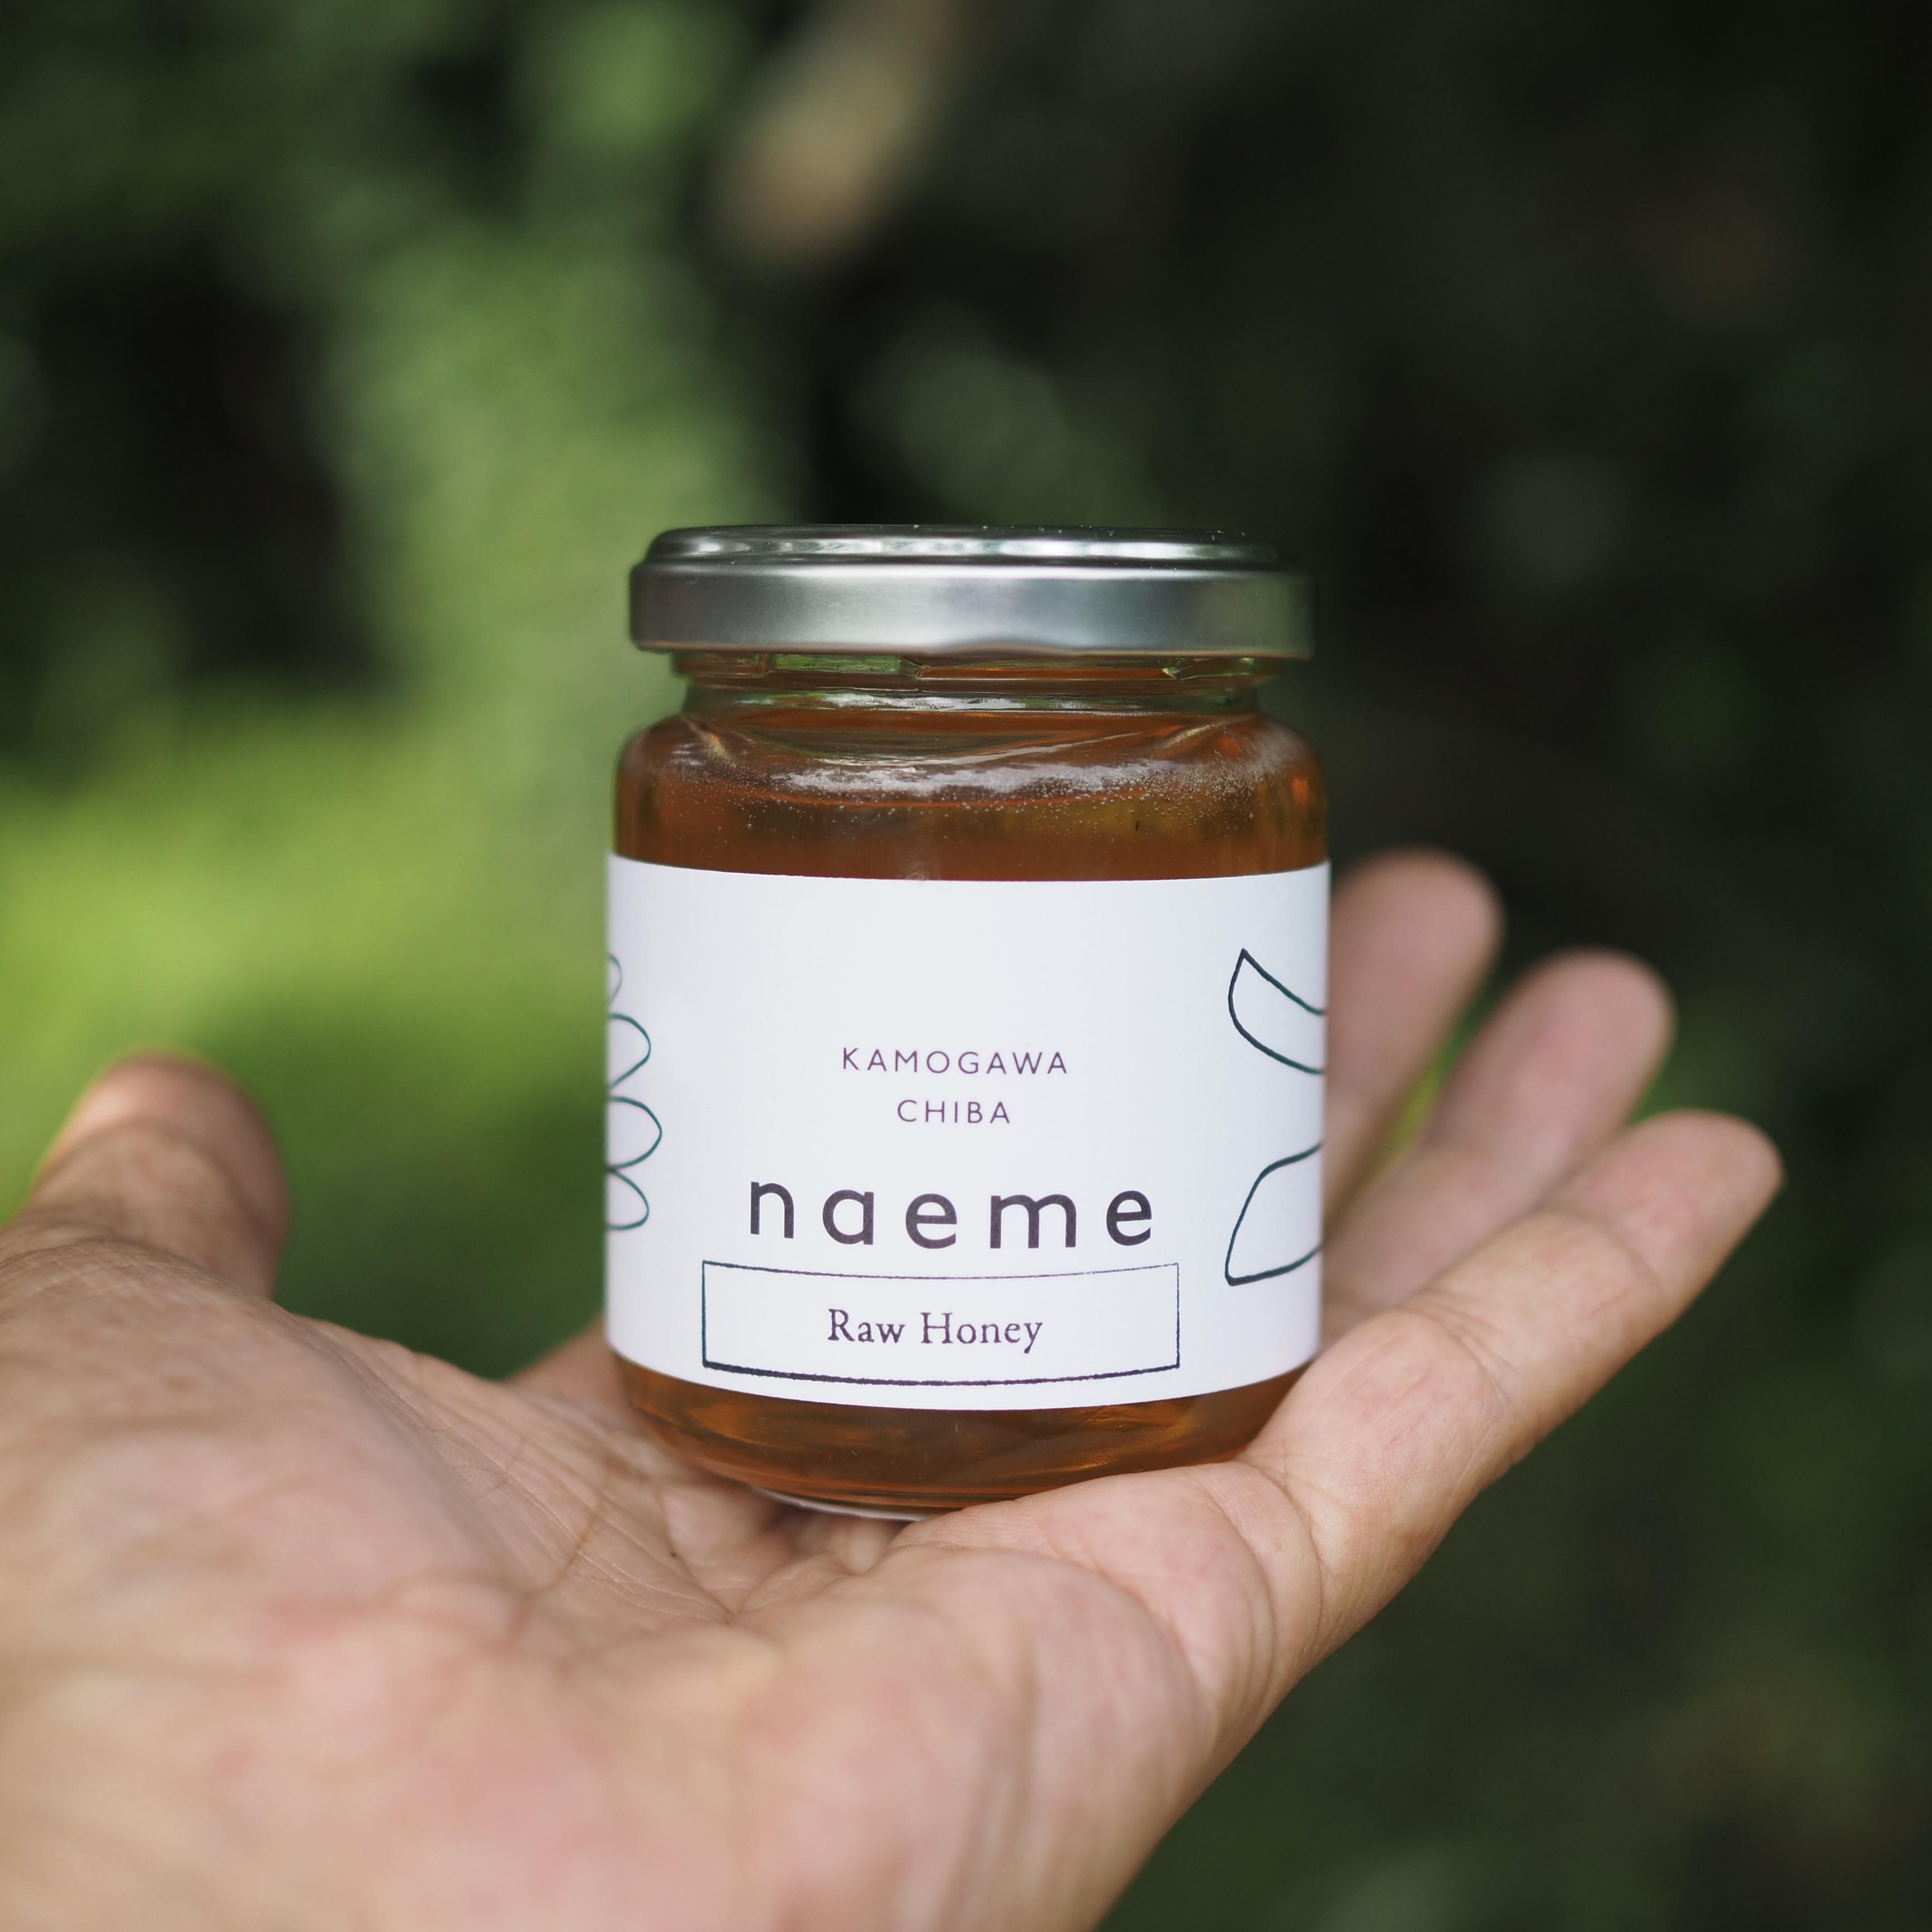 raw honey wild plants 2020 里山蜜 夏